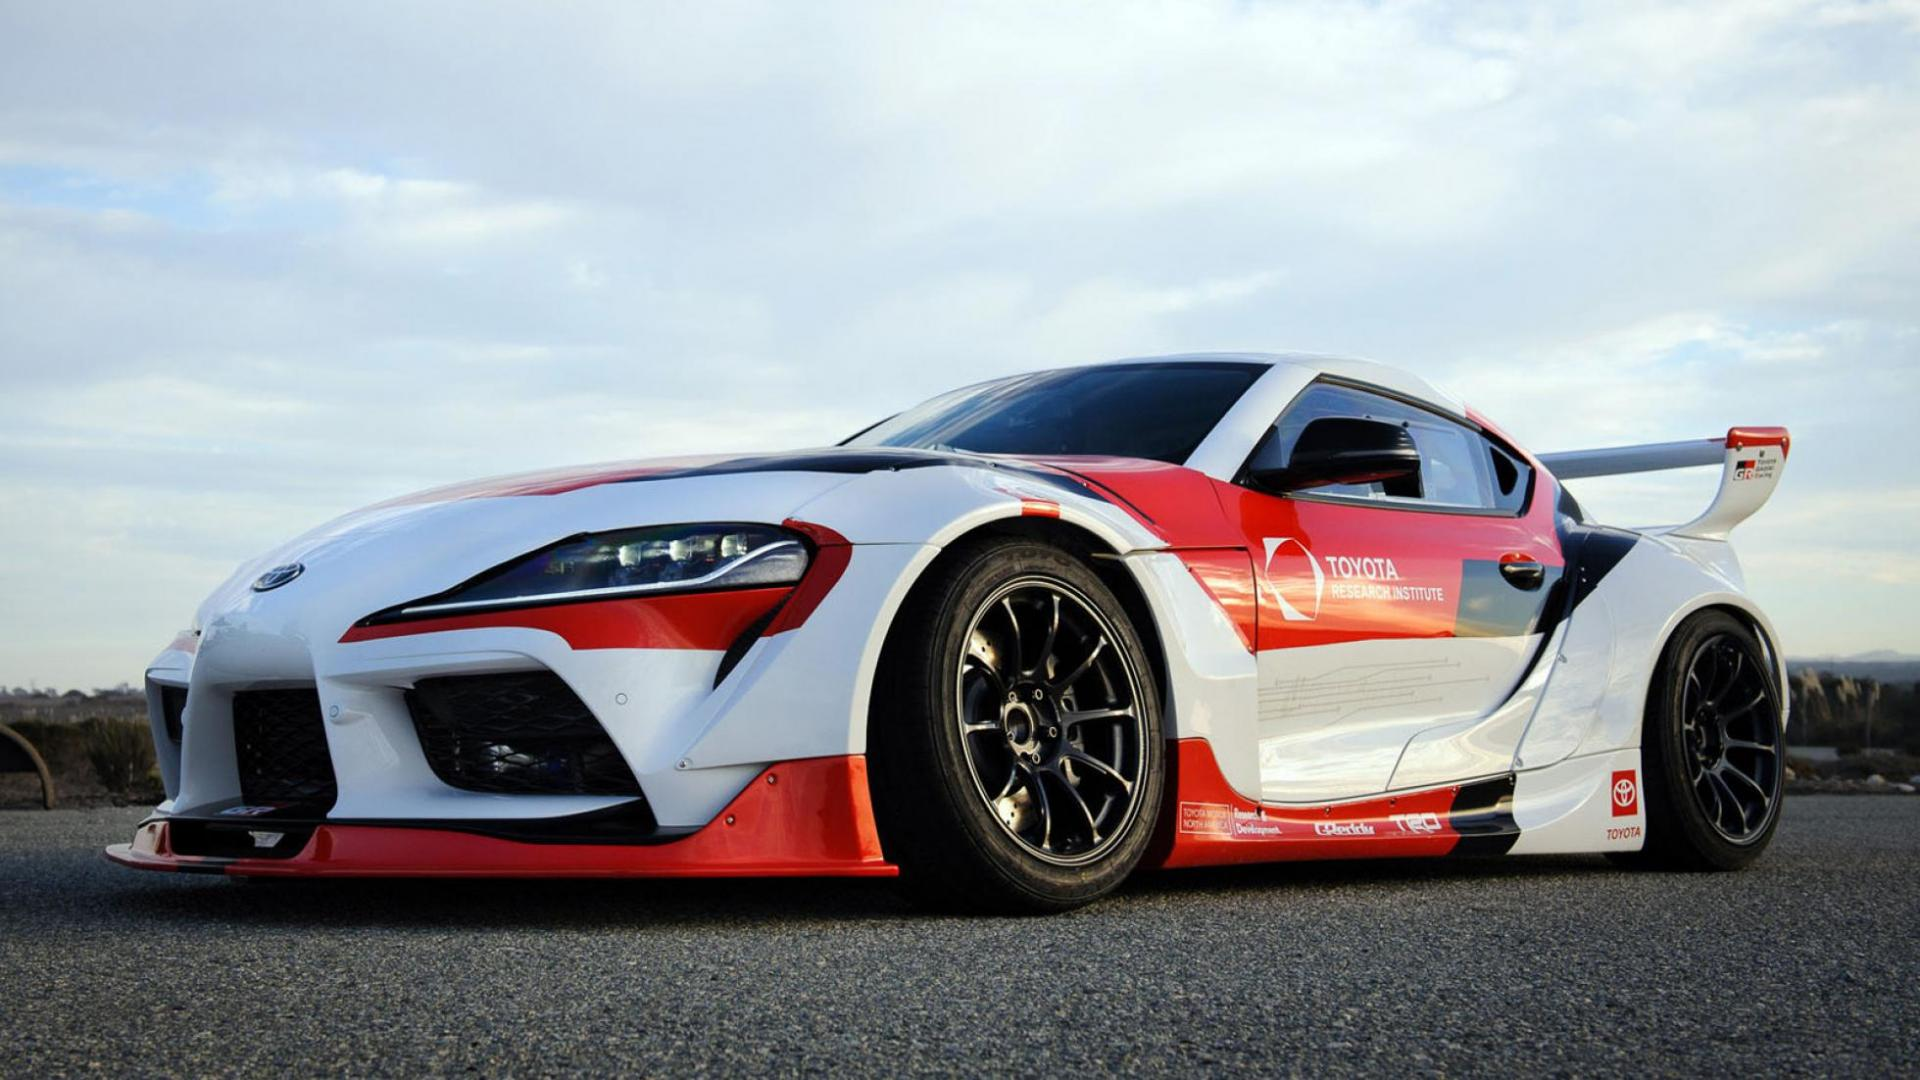 Toyota has developed a self driving supra drift car